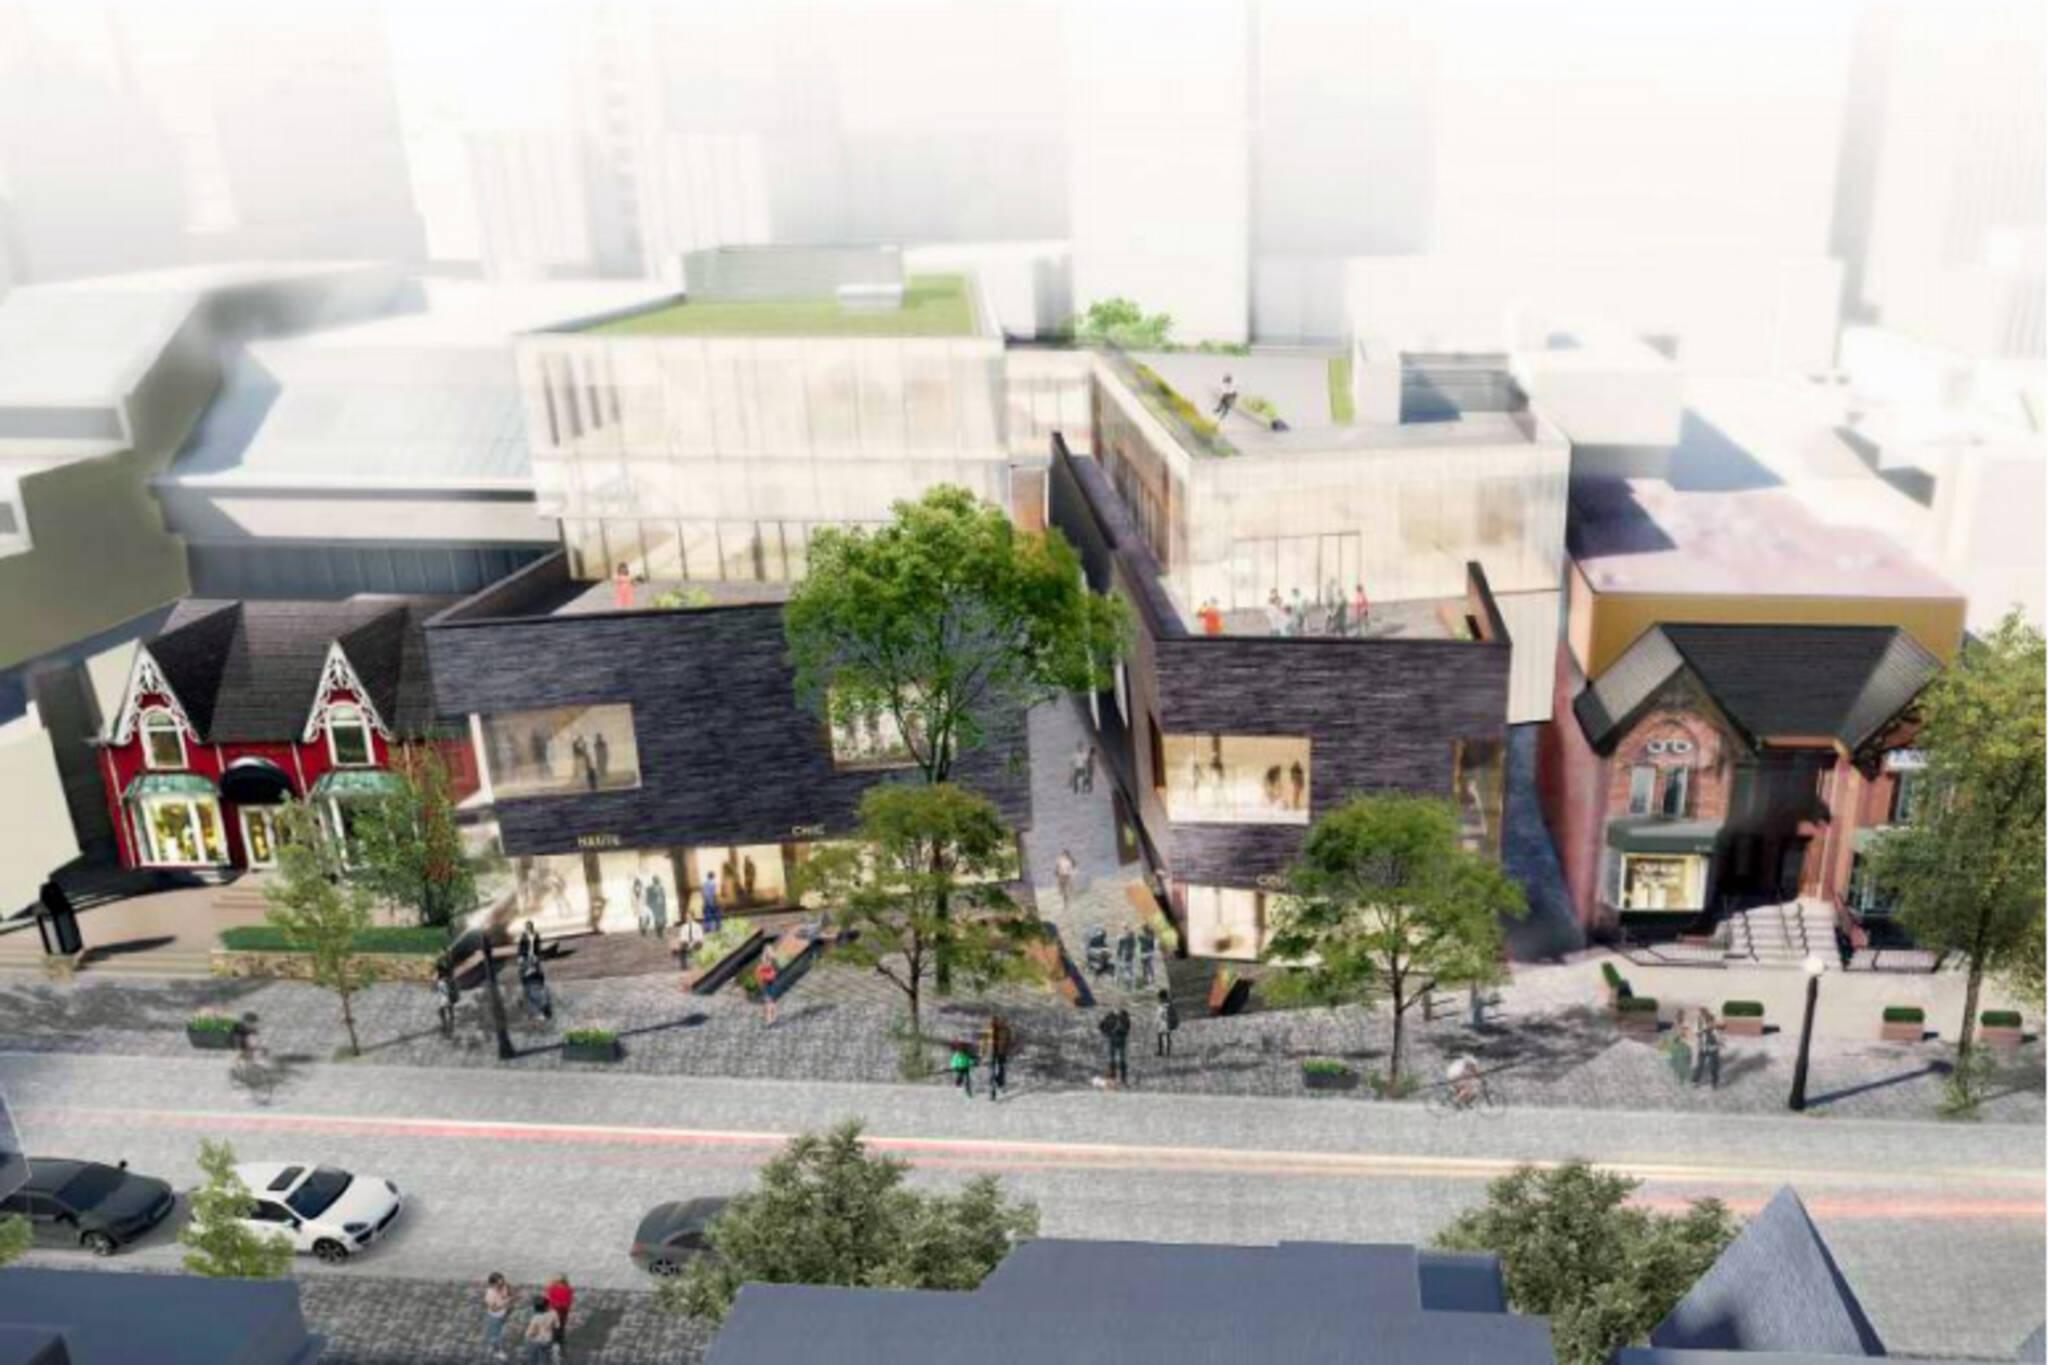 101 Yorkville development